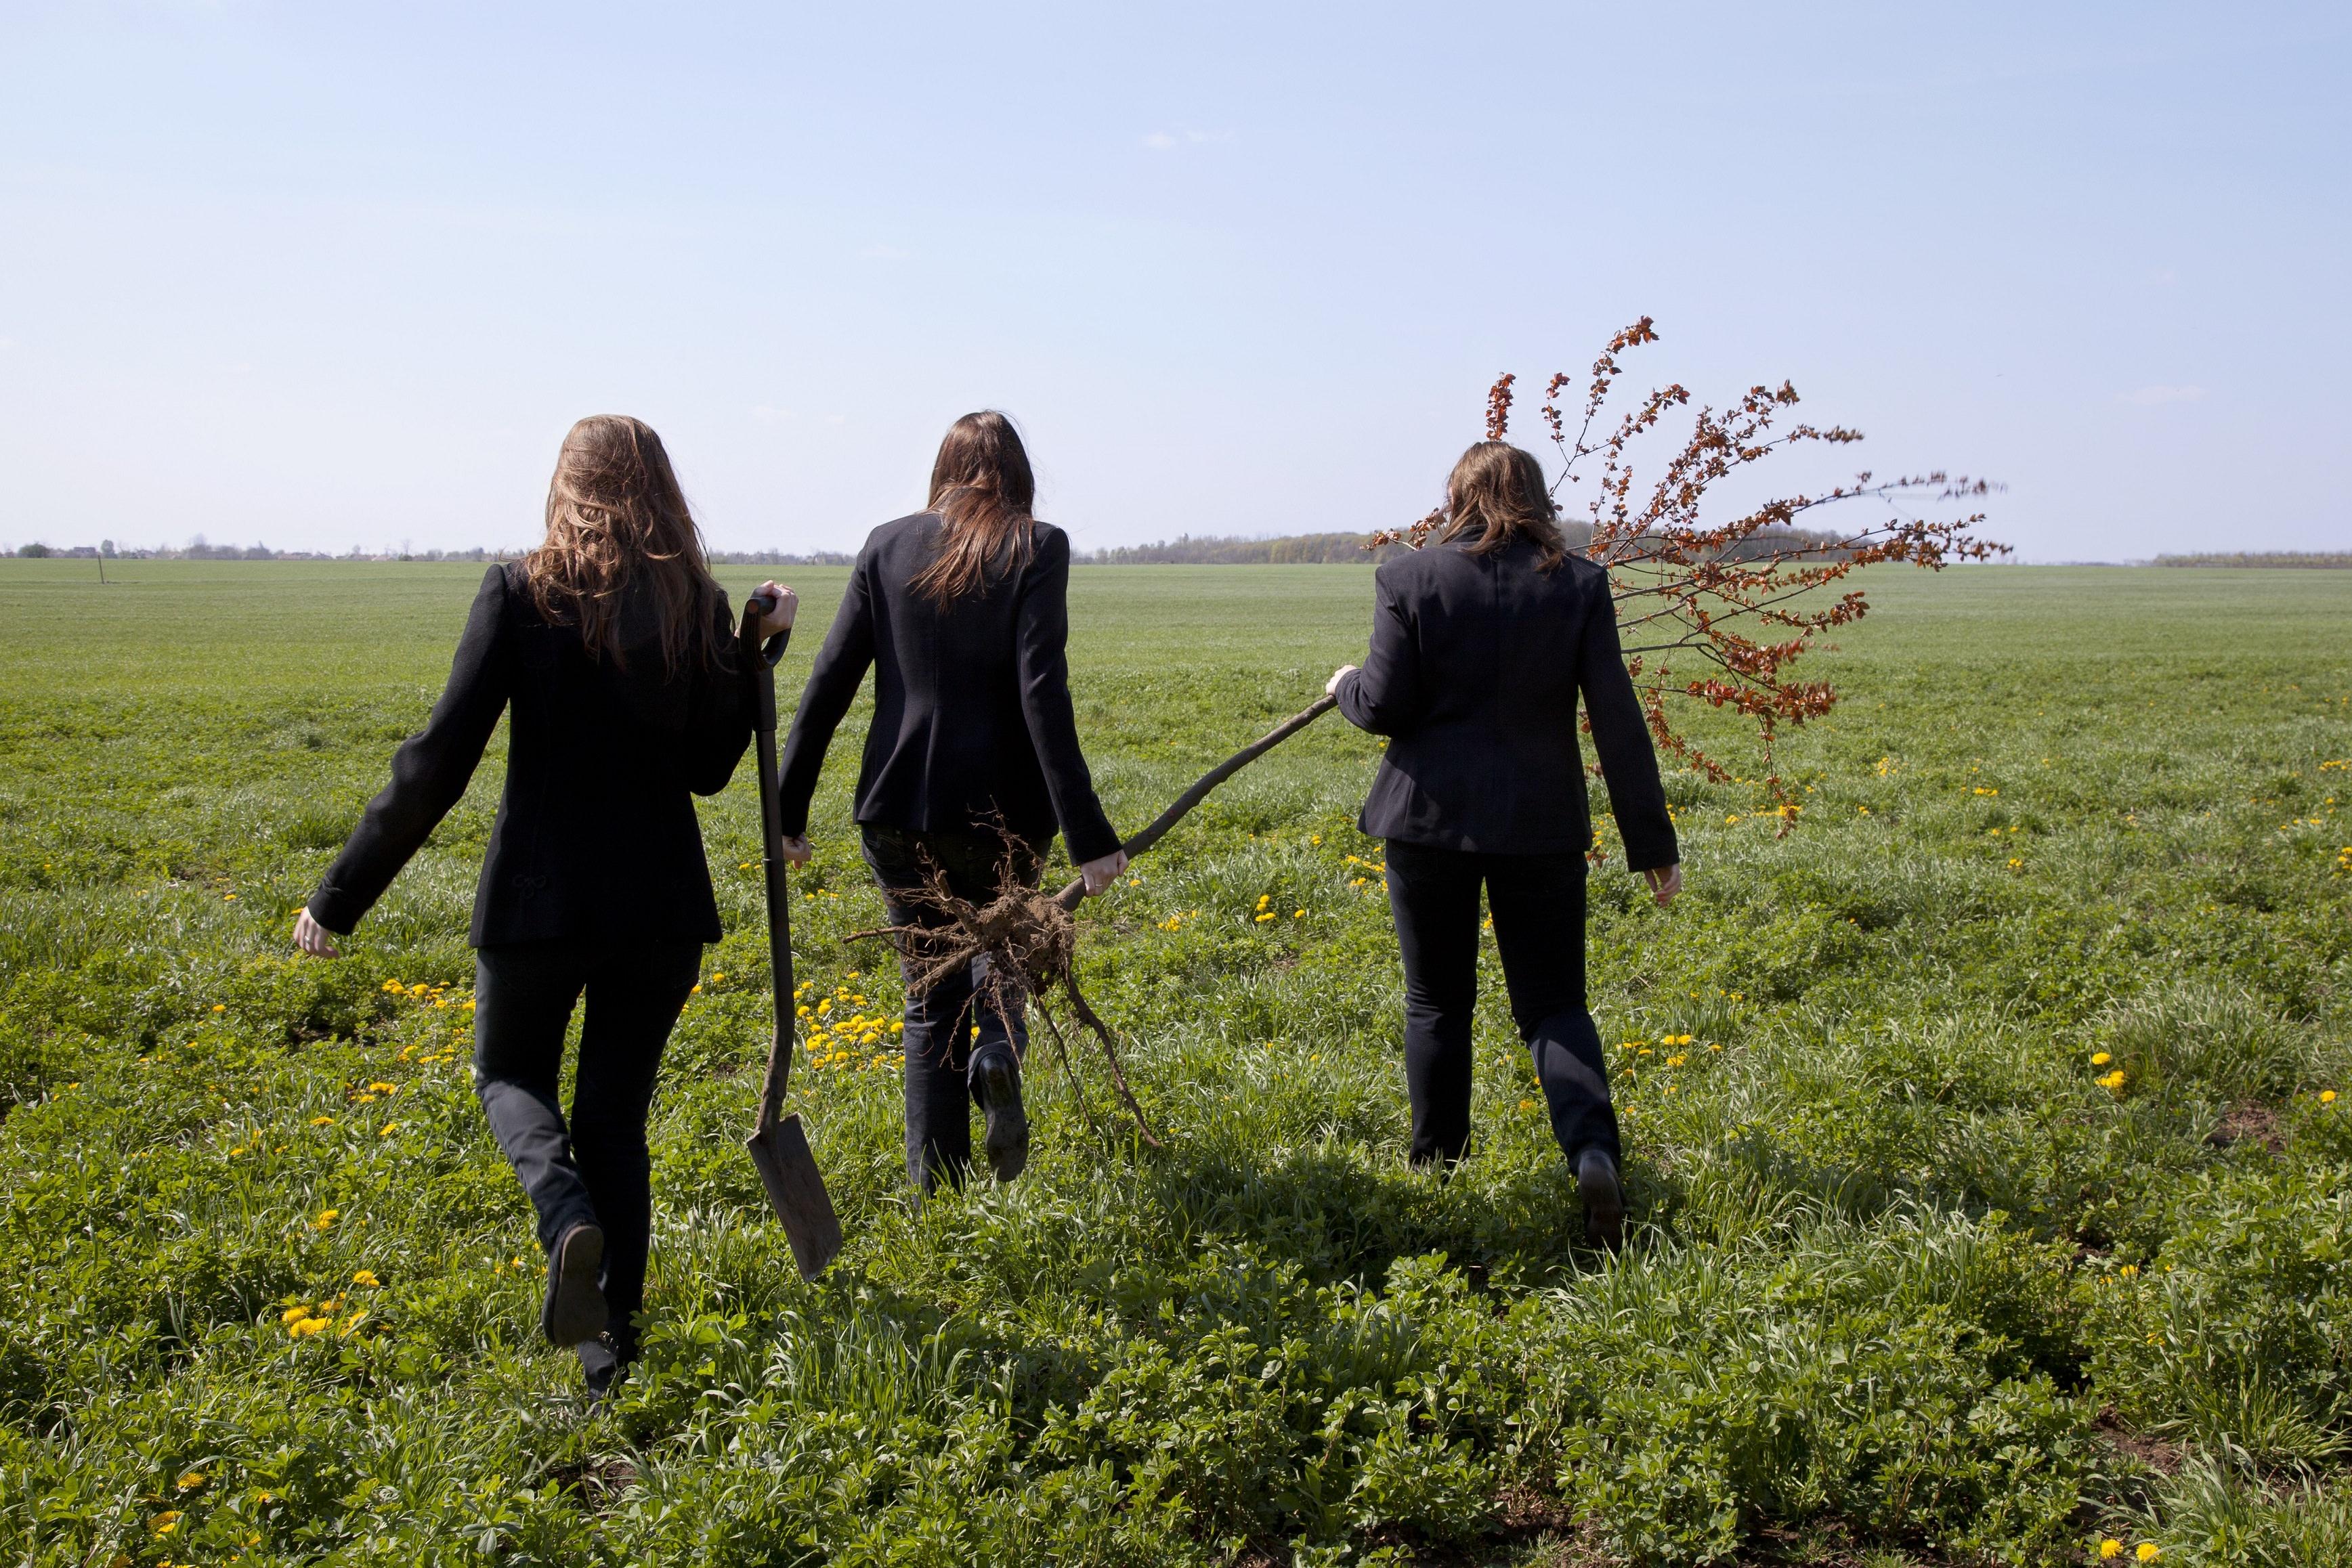 Fátyol Viola: Faültetés 1./Tree Planting 1. (Orando et laborando - Imádkozva és dolgozva sorozat/from the series Orando et Laborando - Praying and Working), 2011